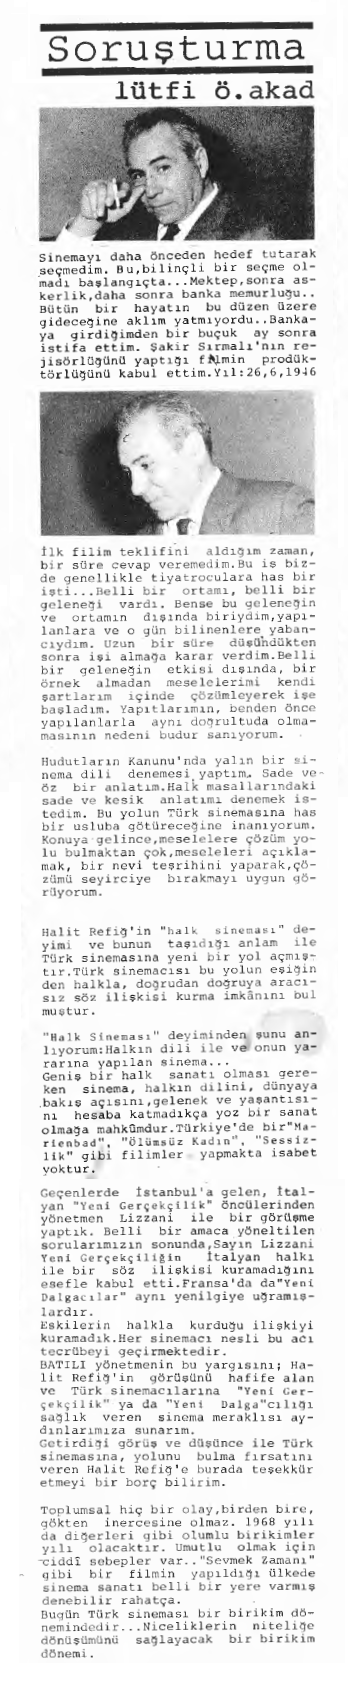 UlusalSinema1968-LutfiAkad.tif